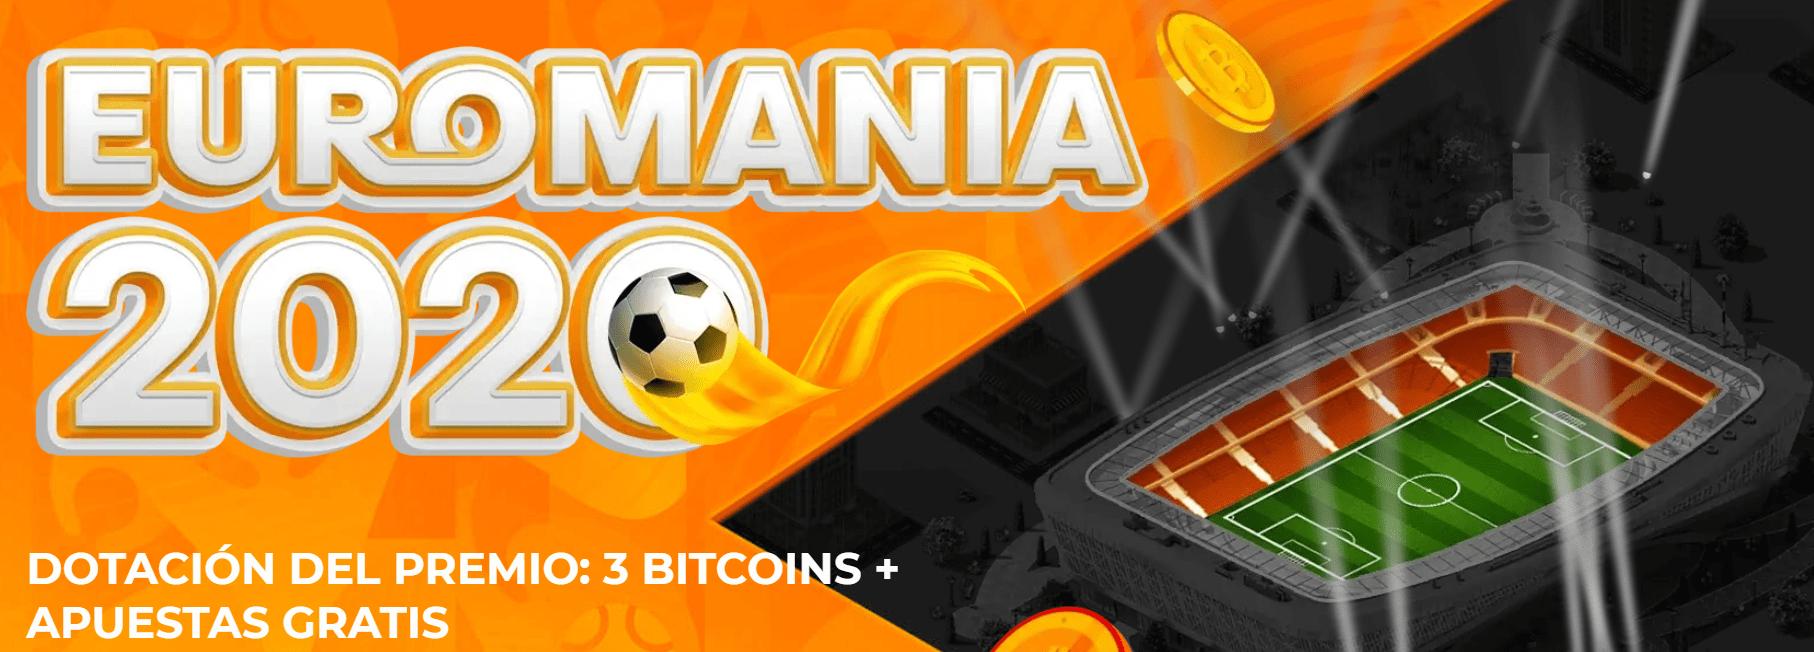 Euromania 1xbit casino